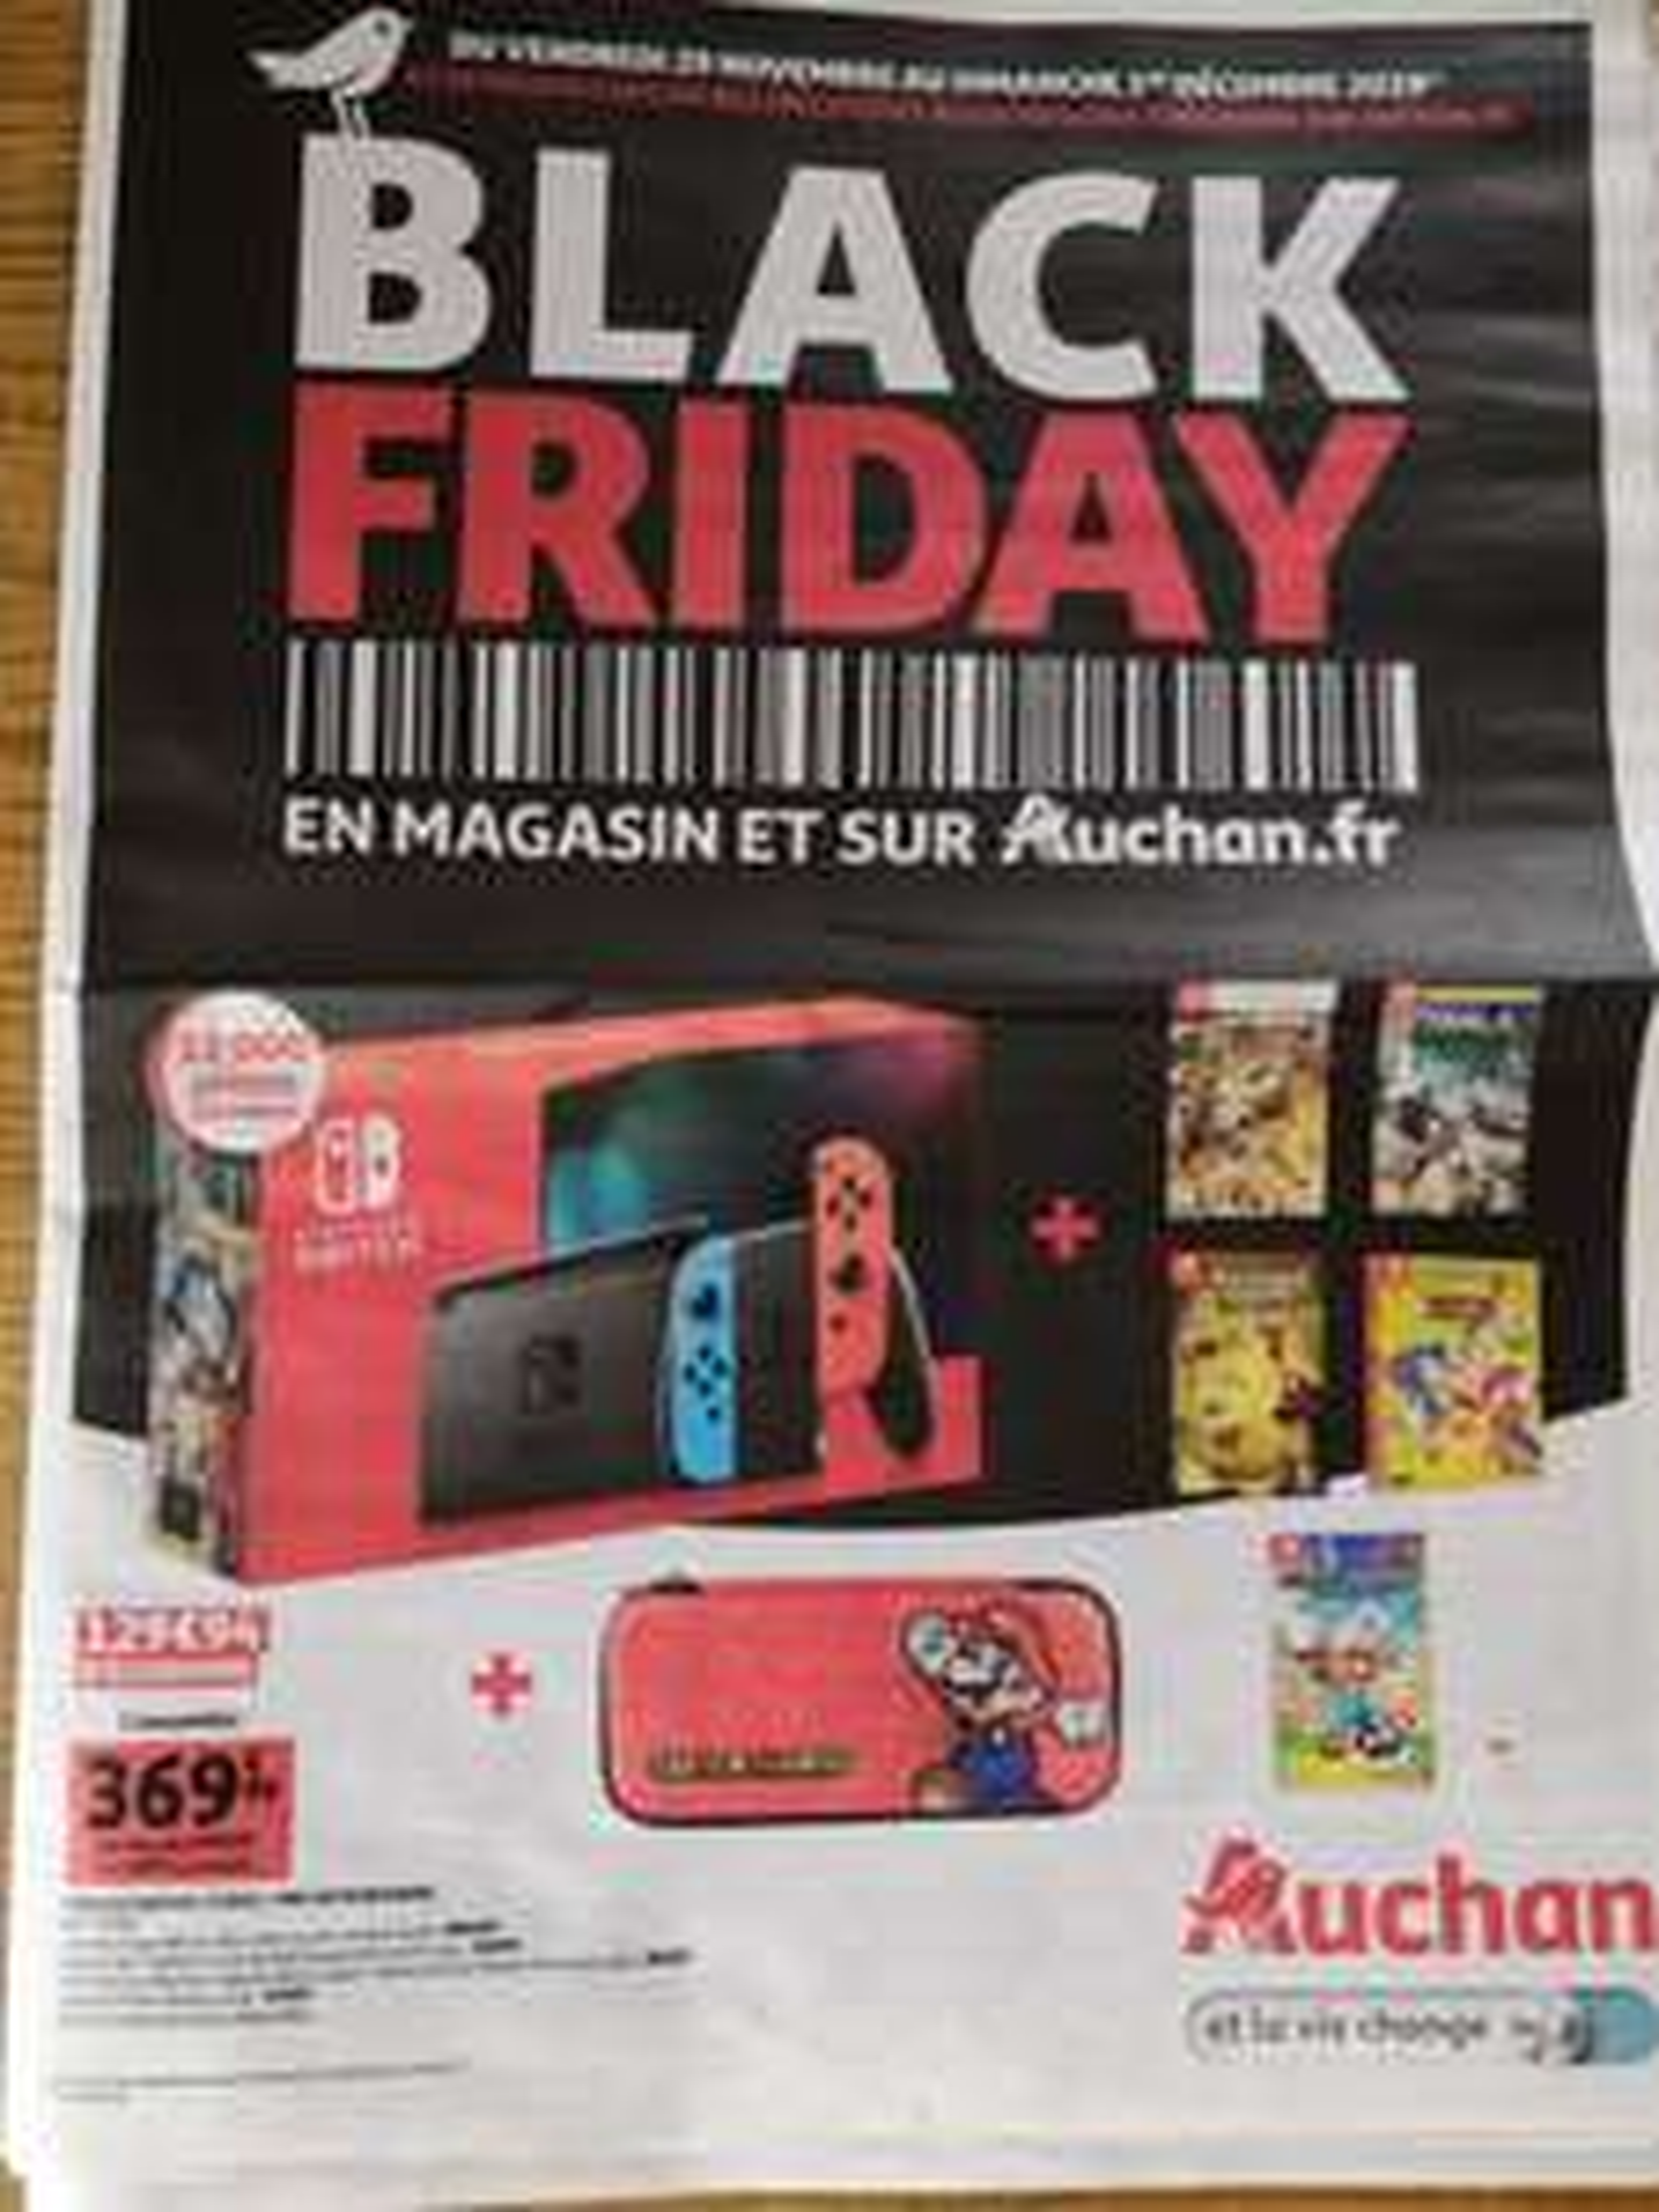 Console Nintendo switch + 5 jeux + sacoche